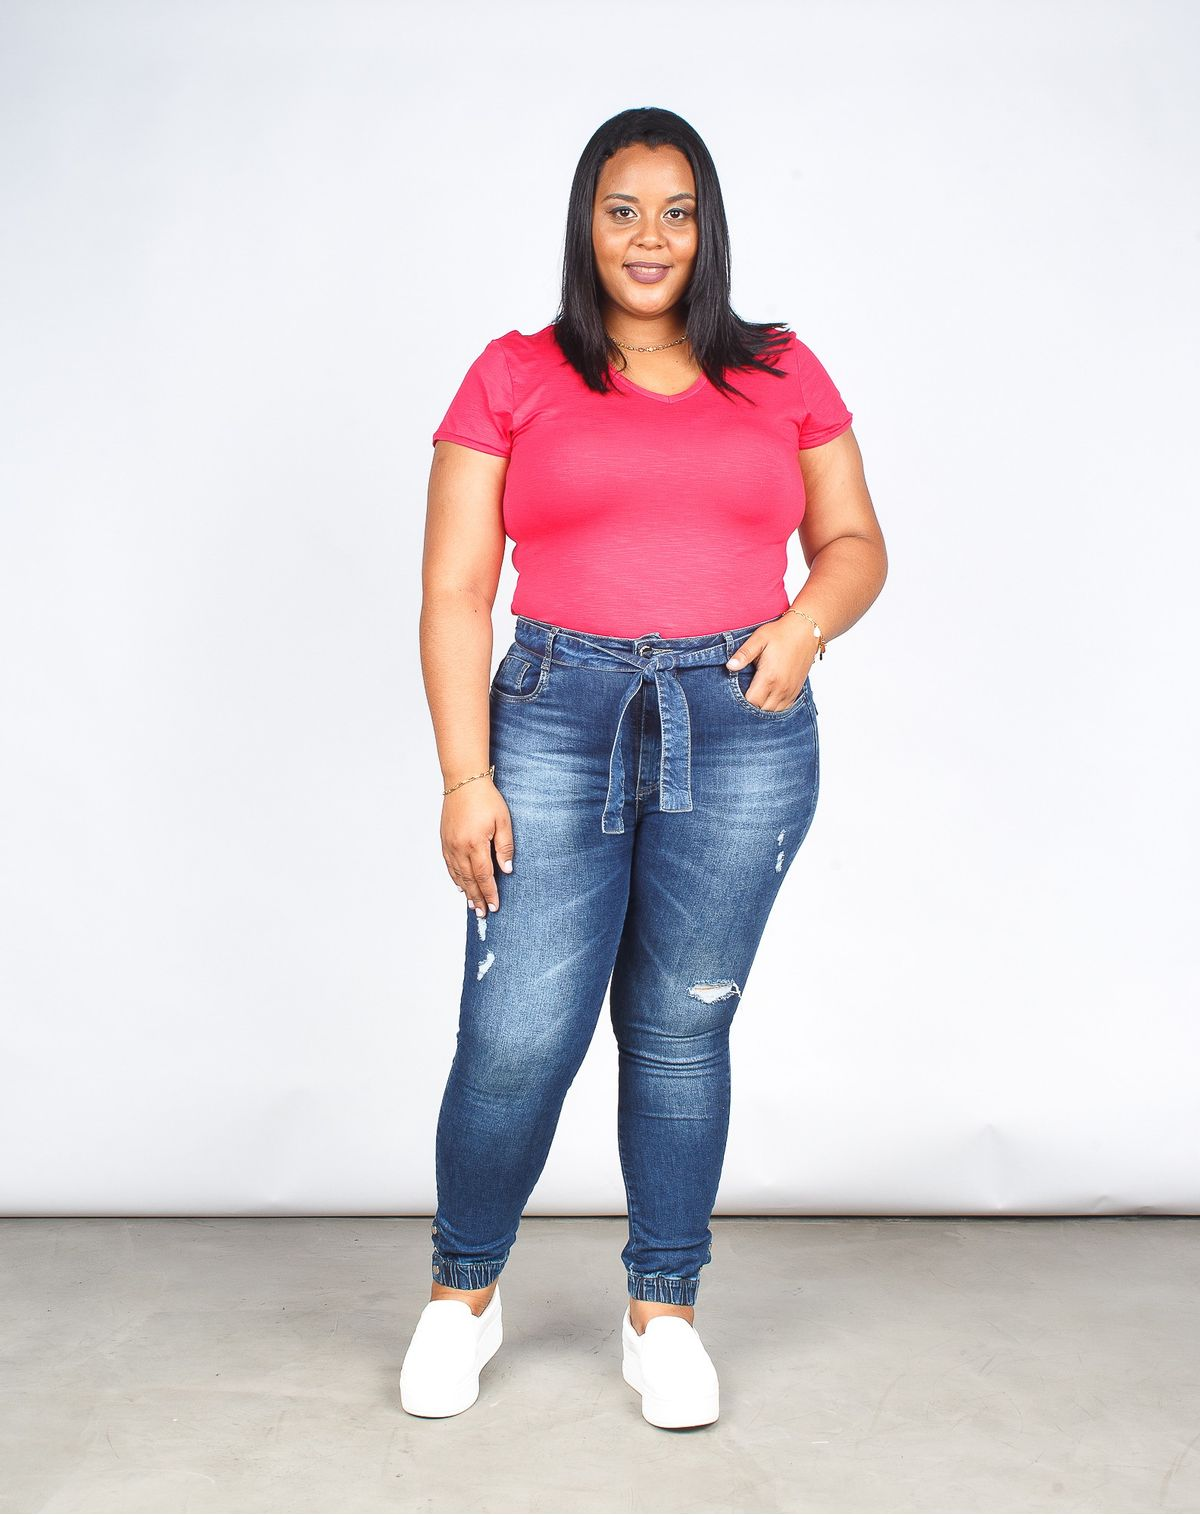 2050006273197-Calca-Jogger-Jeans-Plus-Feminina-Clochard-JEANS-46-1